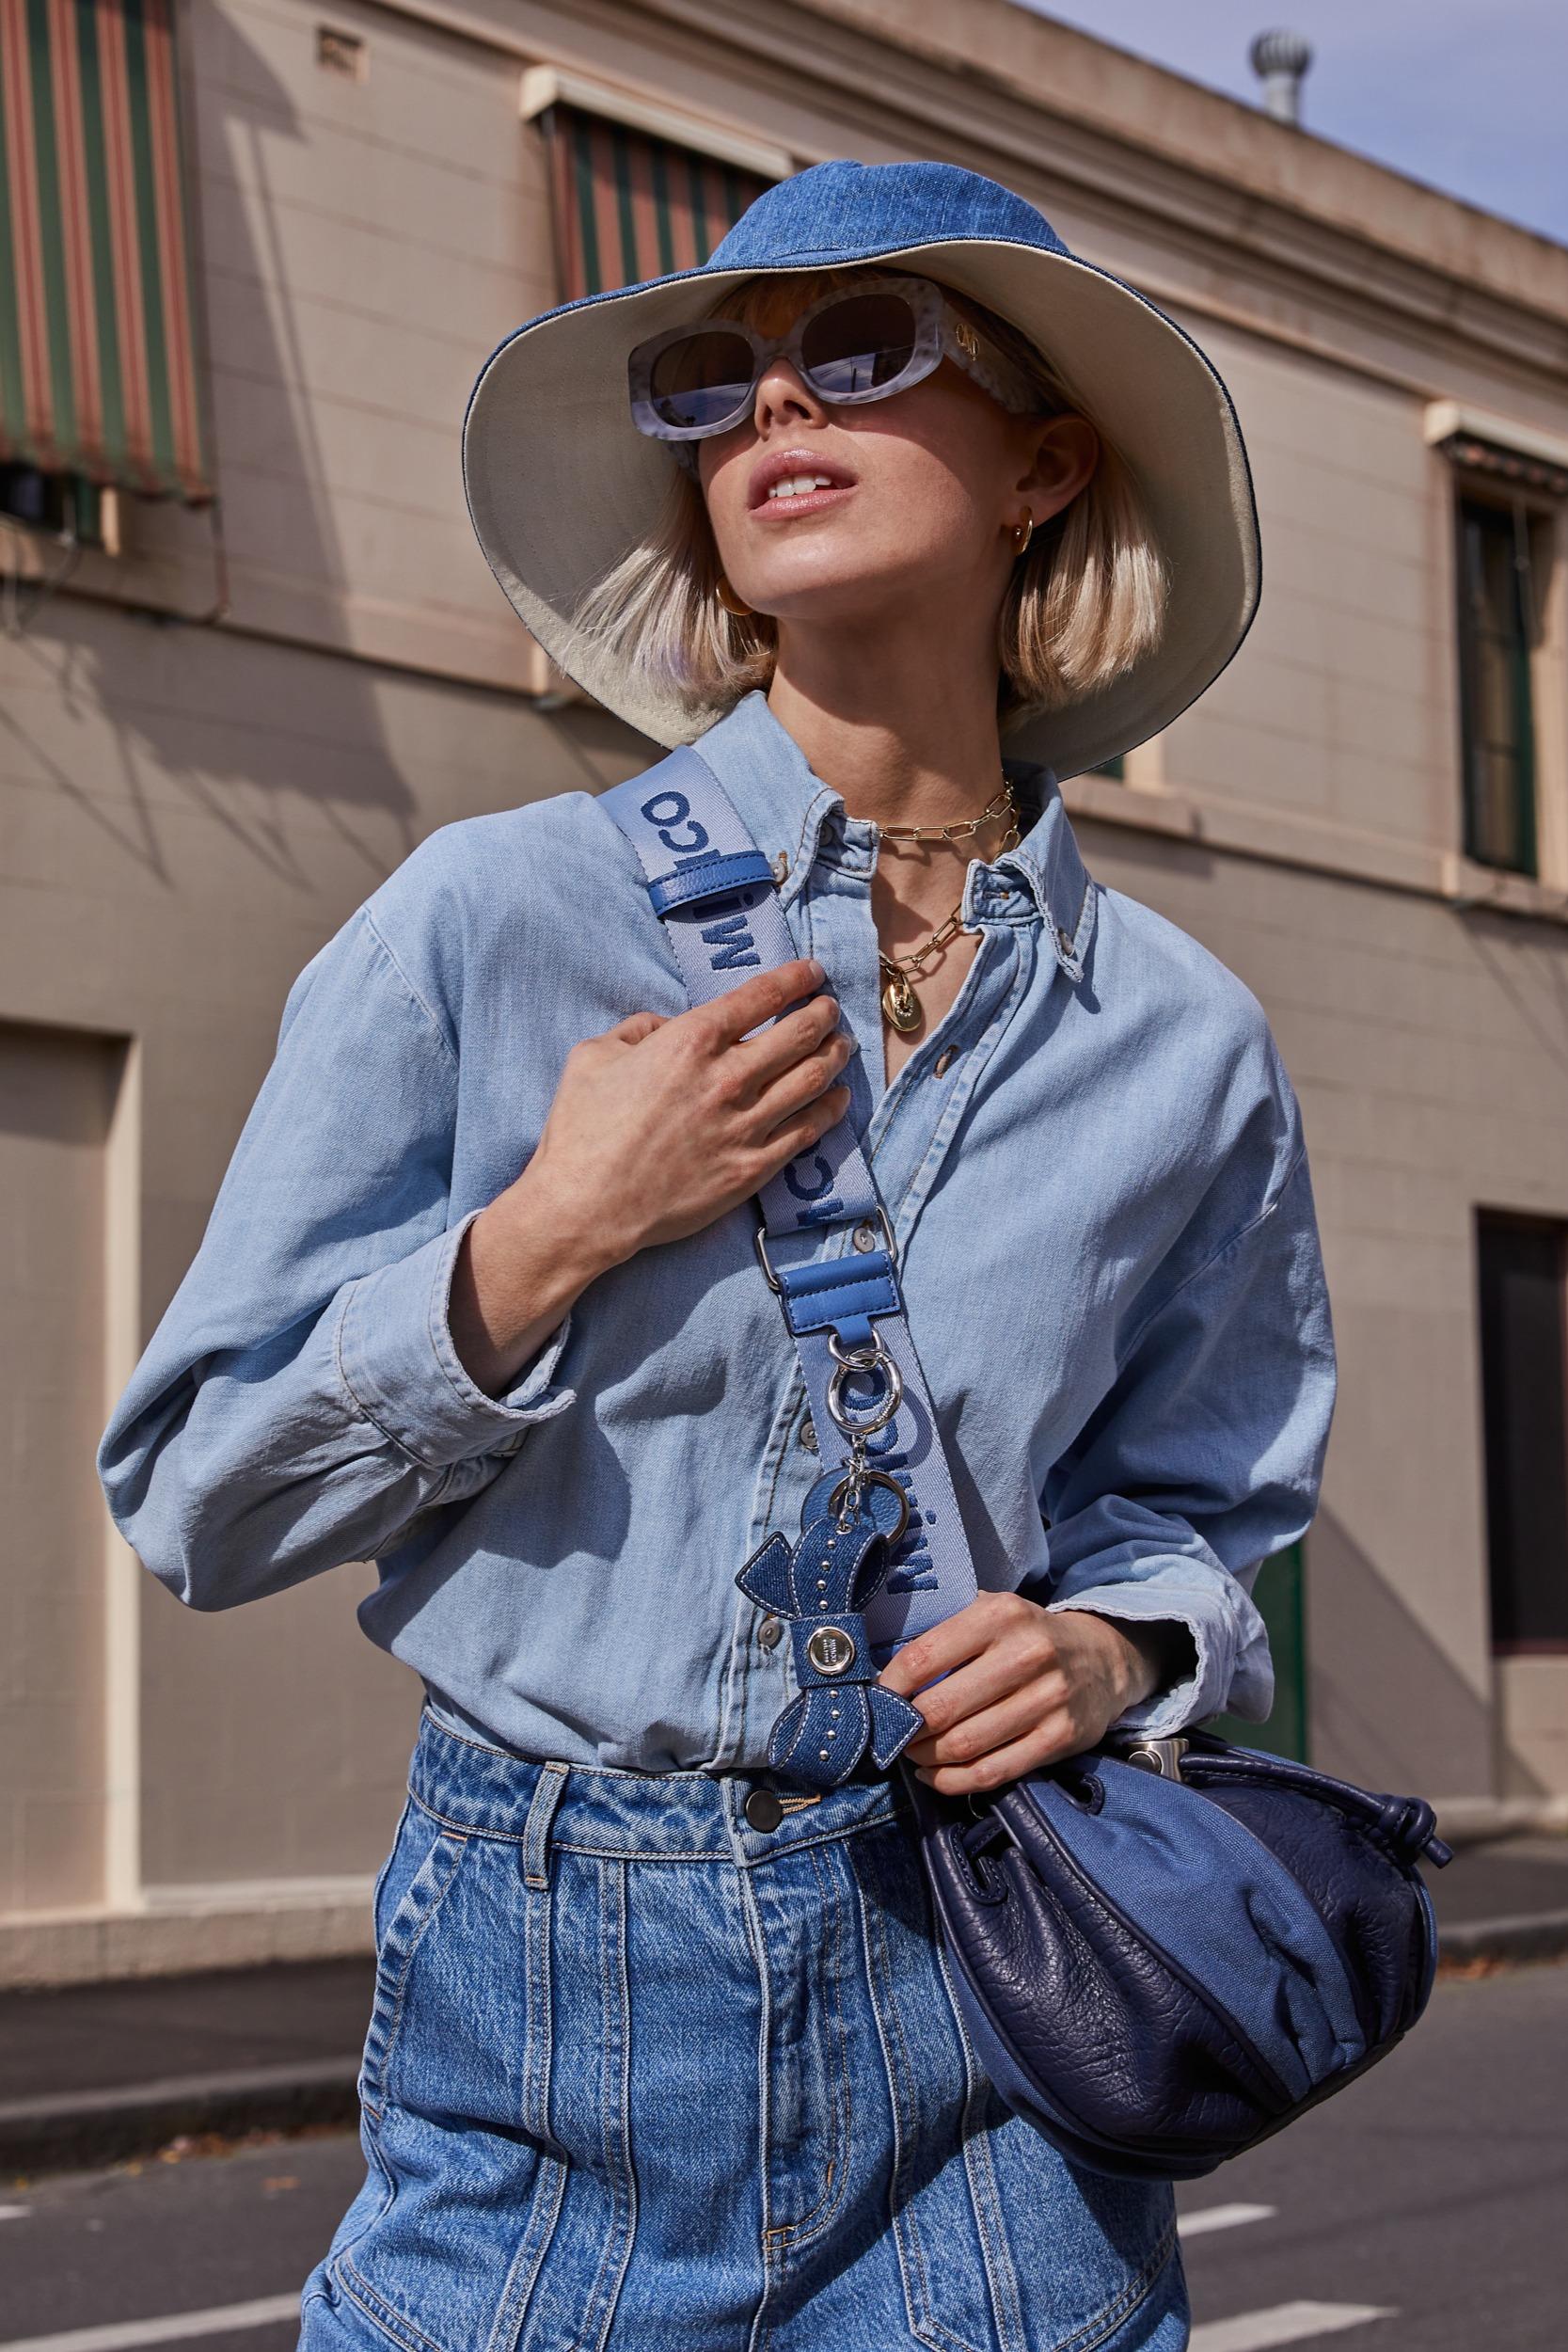 Chloe Wheatland for Mimco Street Style | Pride Models news